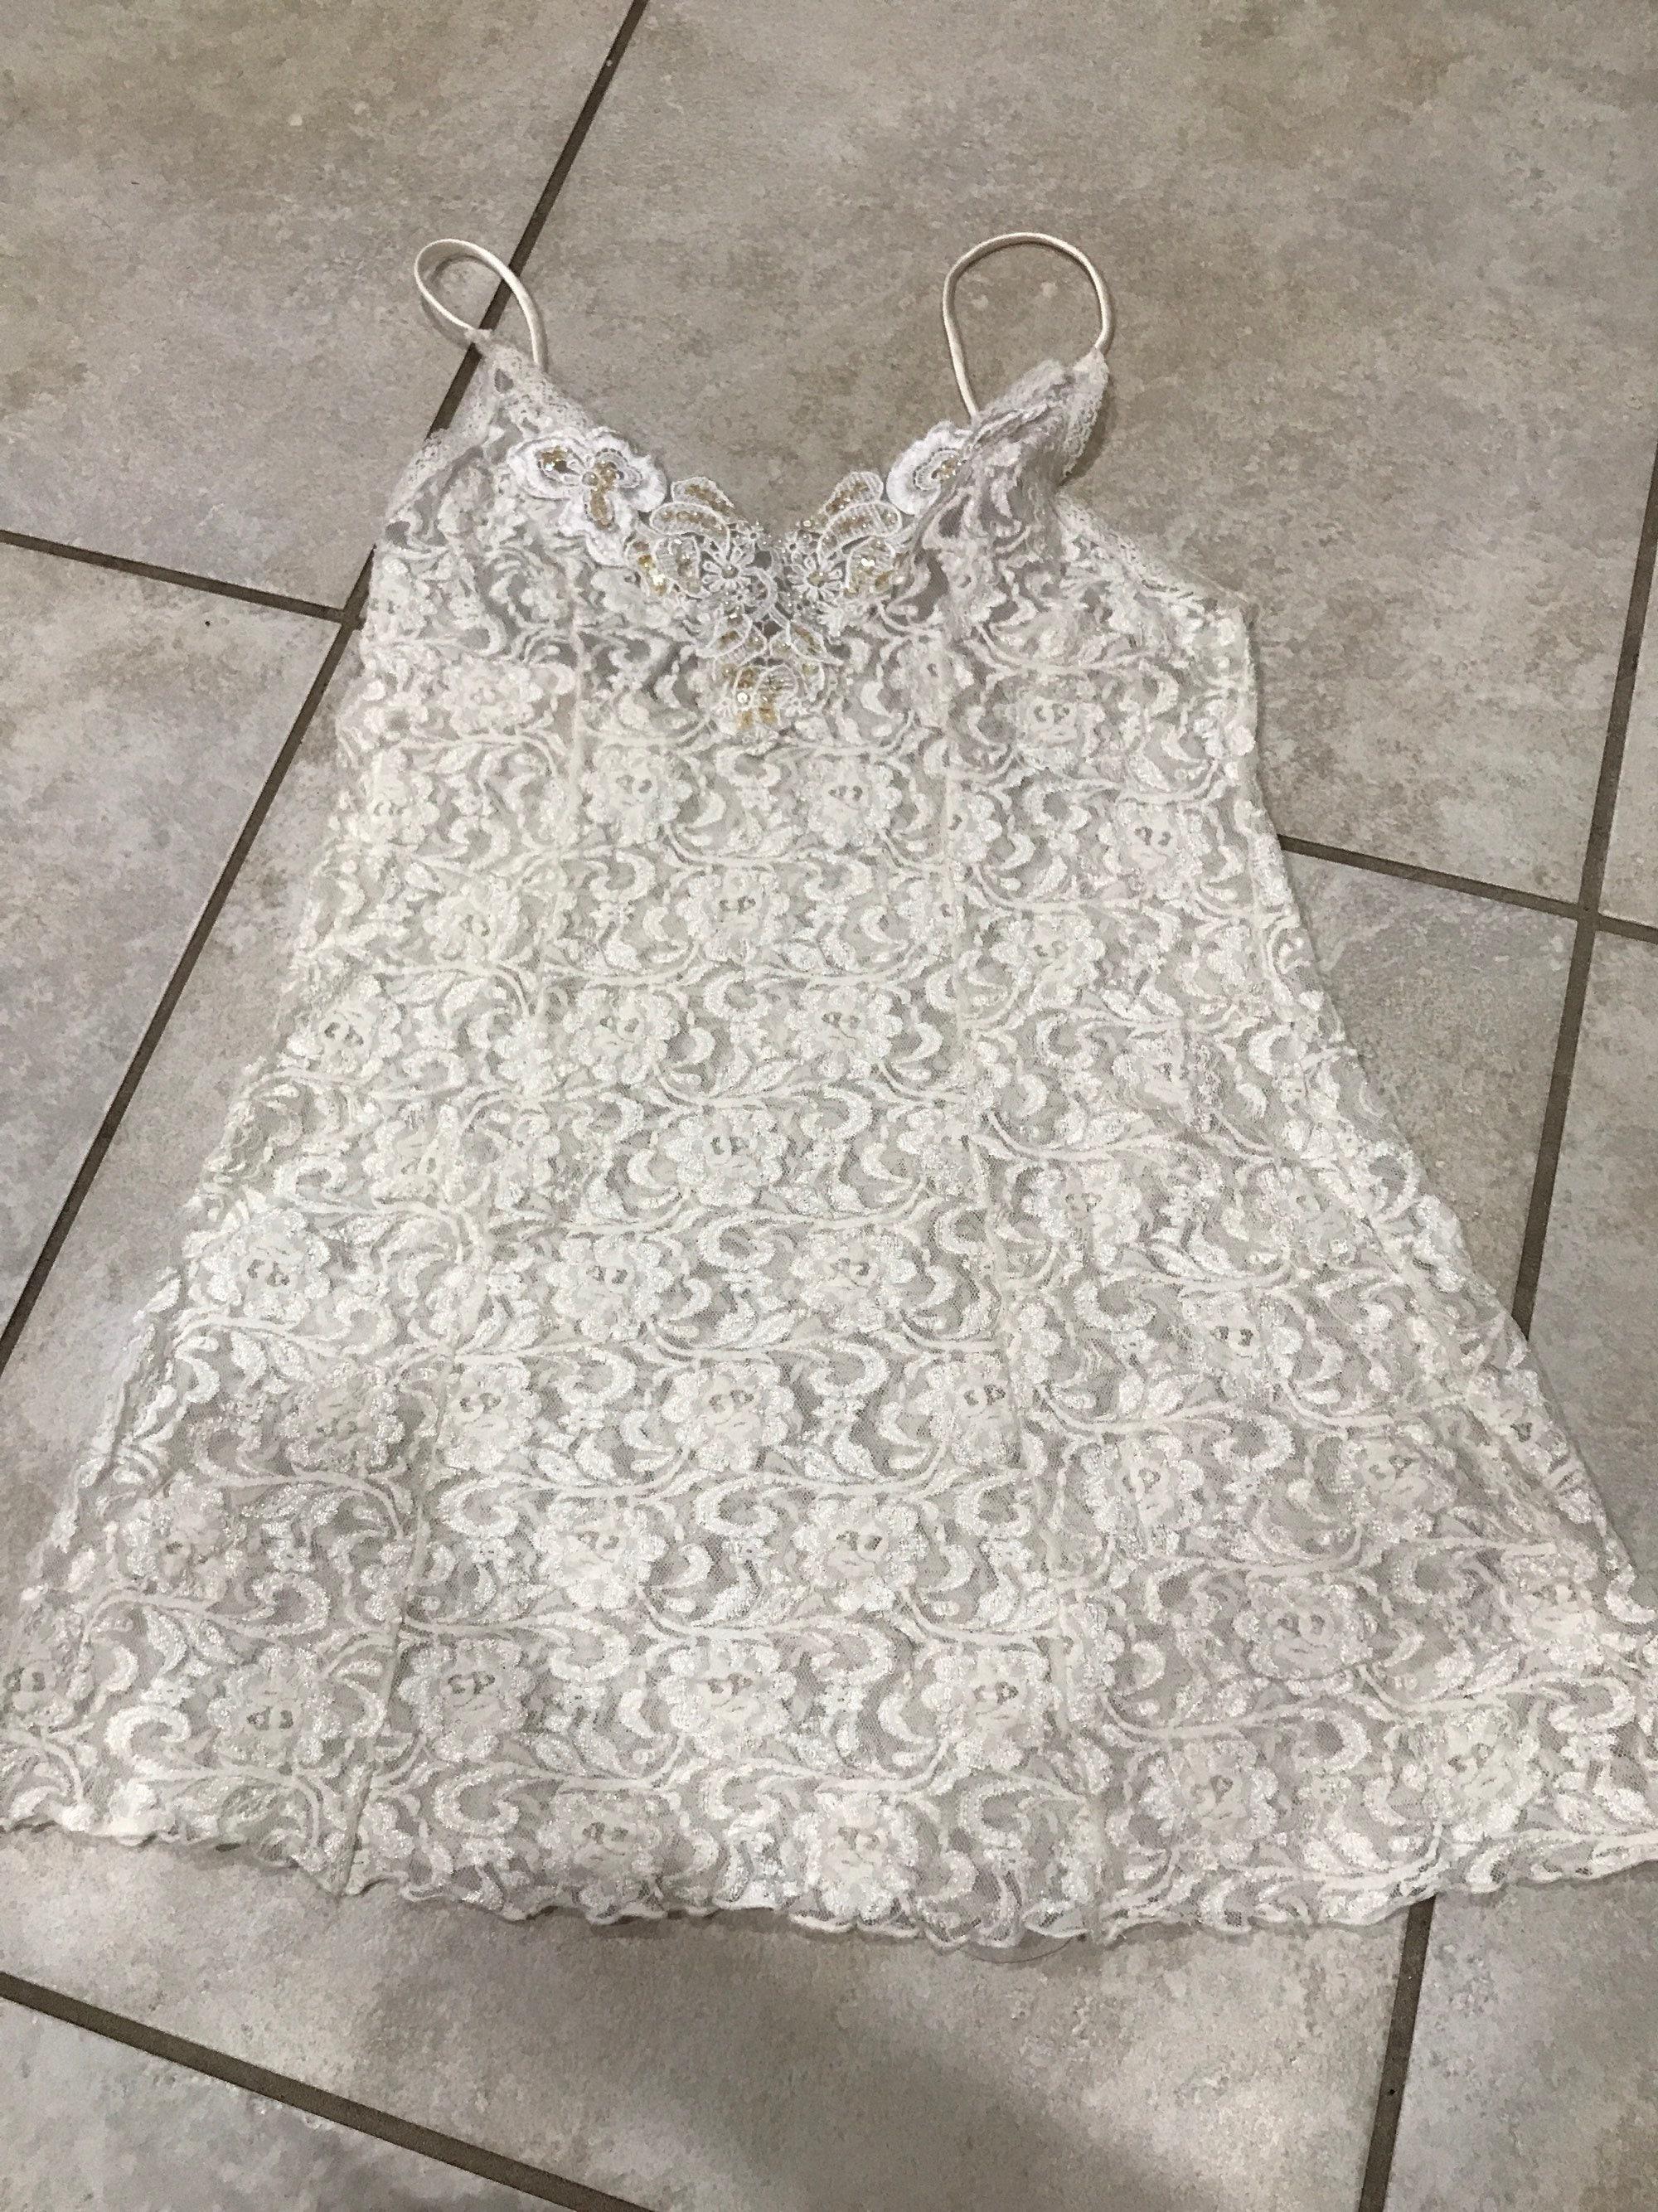 8299c7107a13 Vintage 90's Cream Lace Sheer Slip Dress S nightie | Etsy